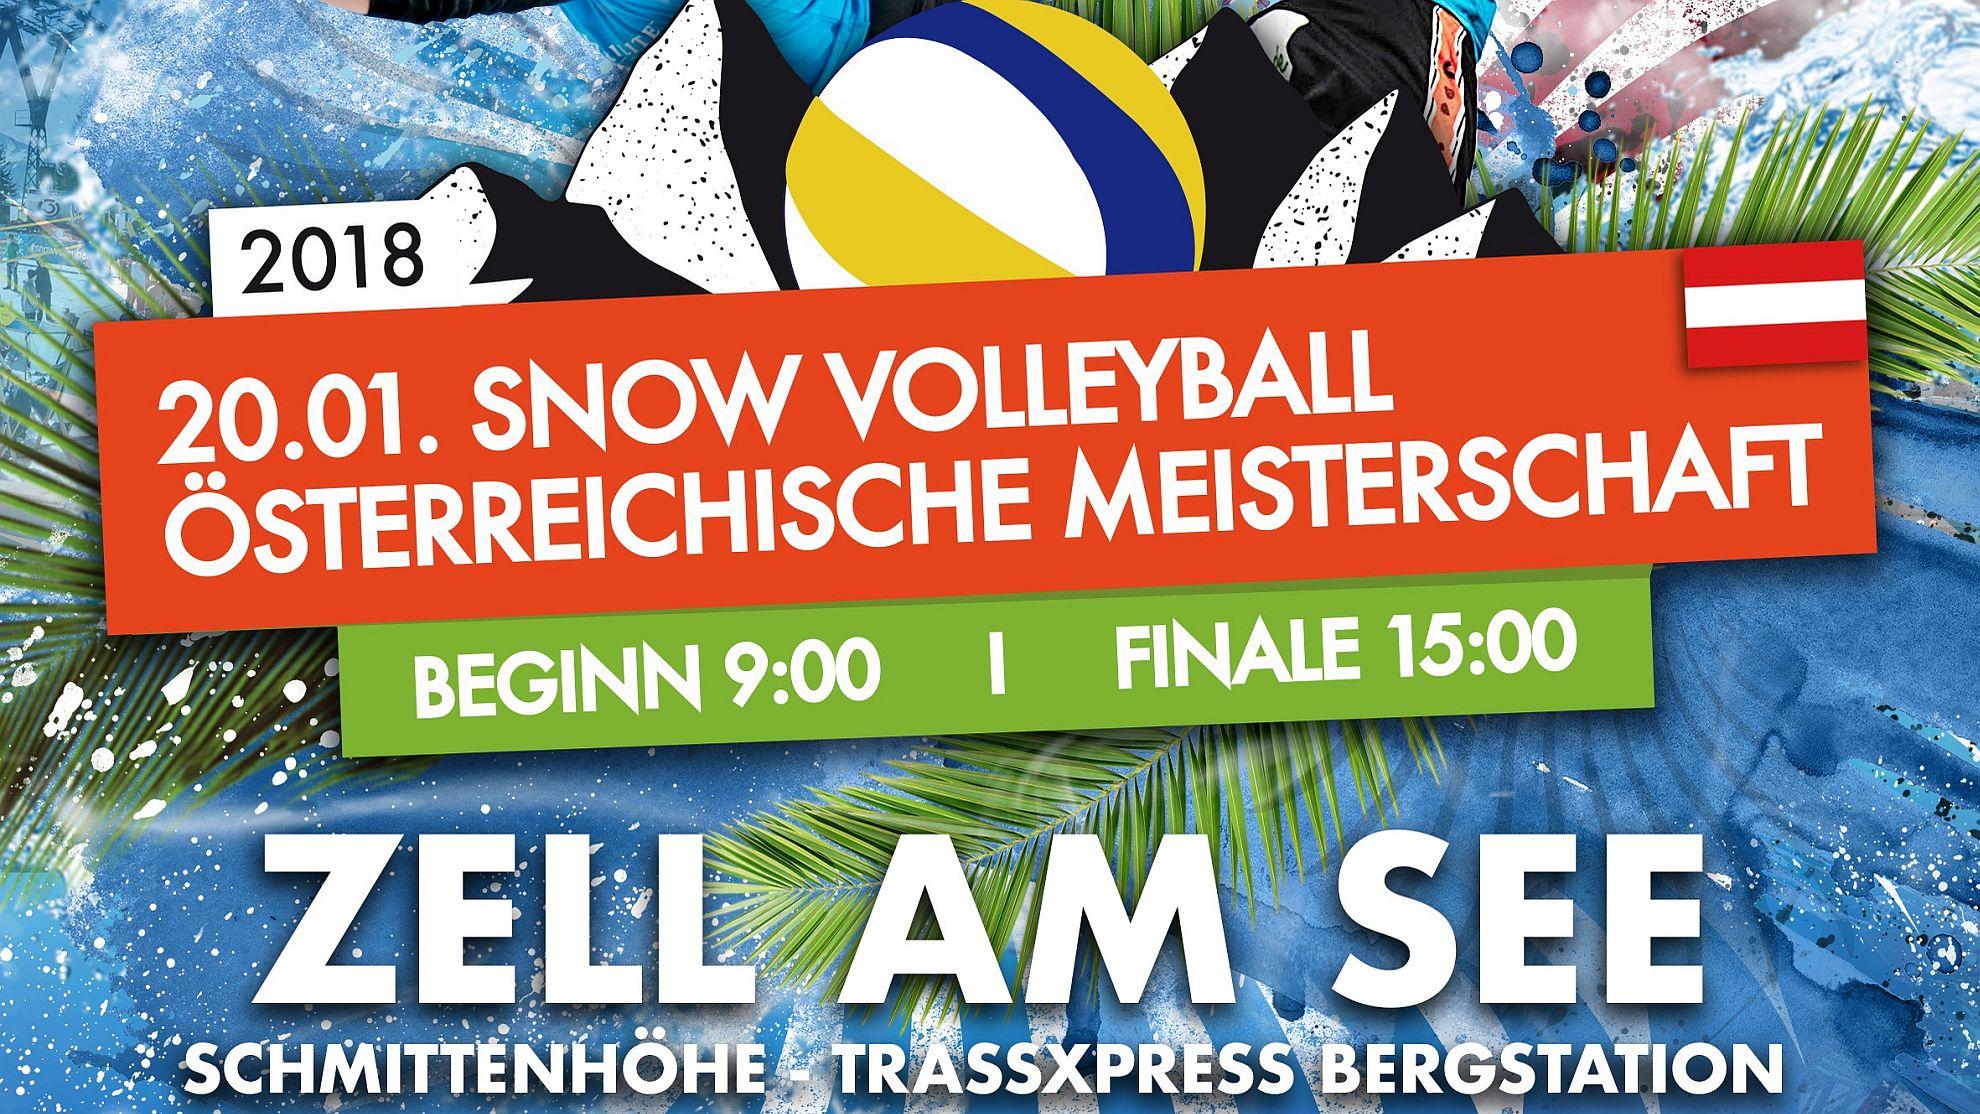 FOTO © snowvolleyball.com